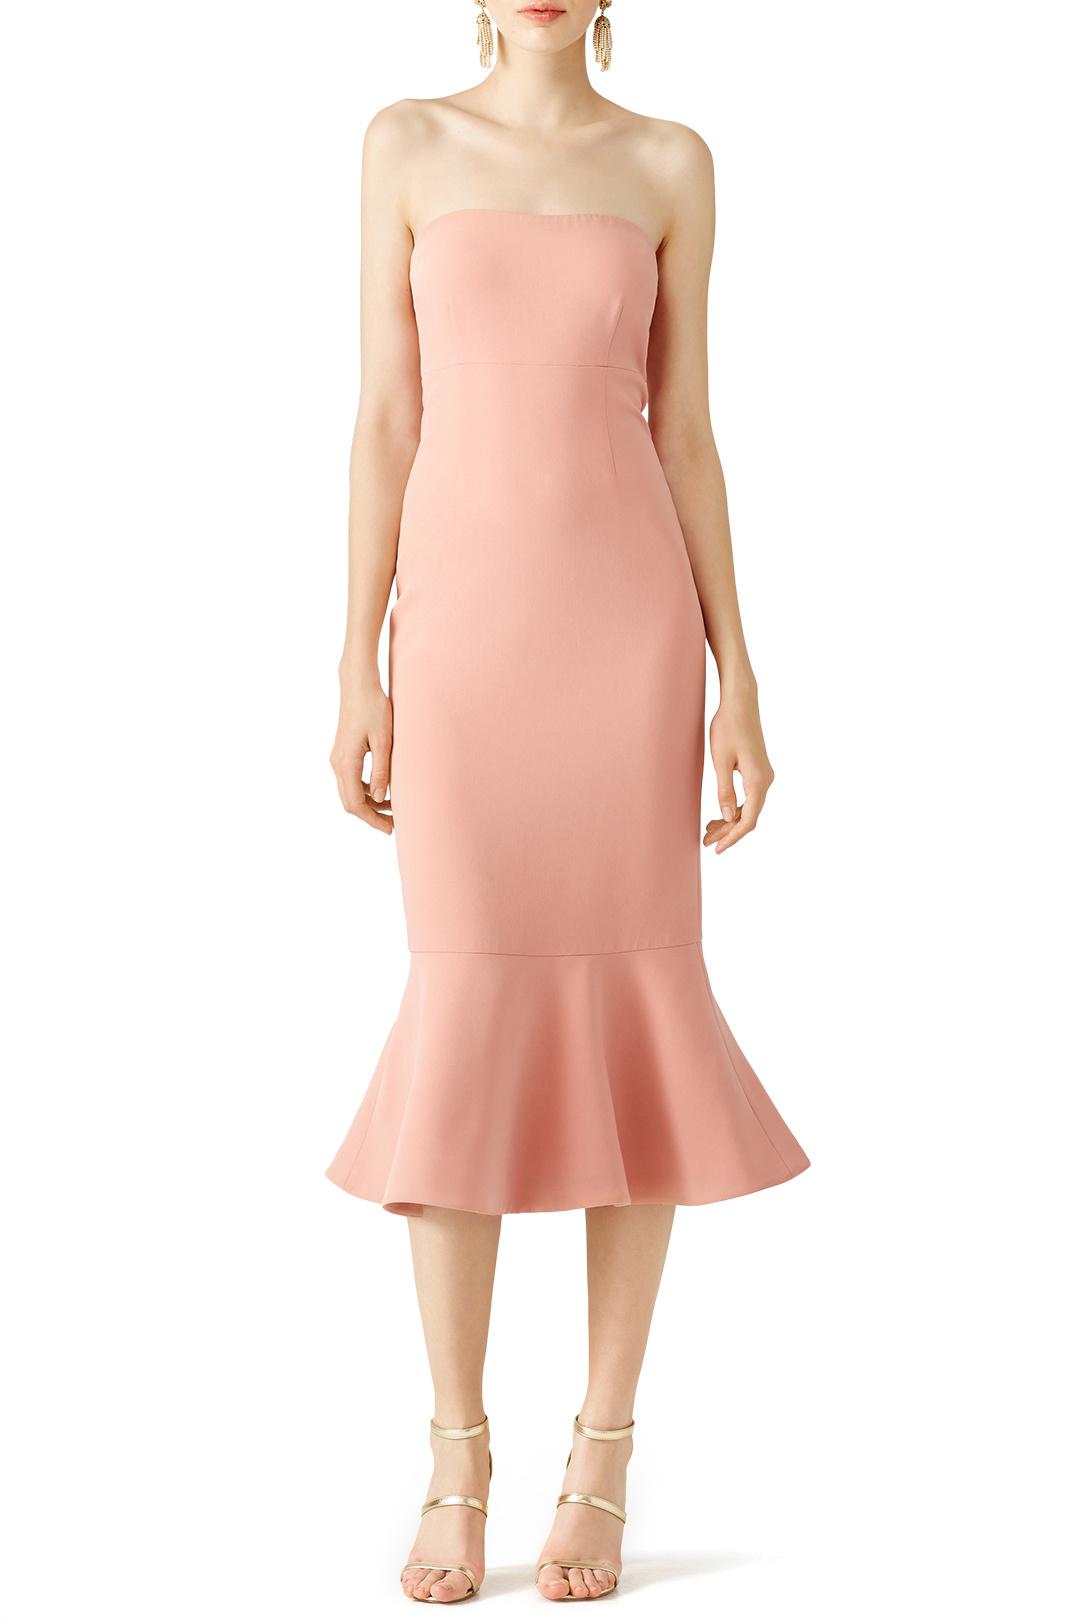 ethical bridesmaid dress ideas